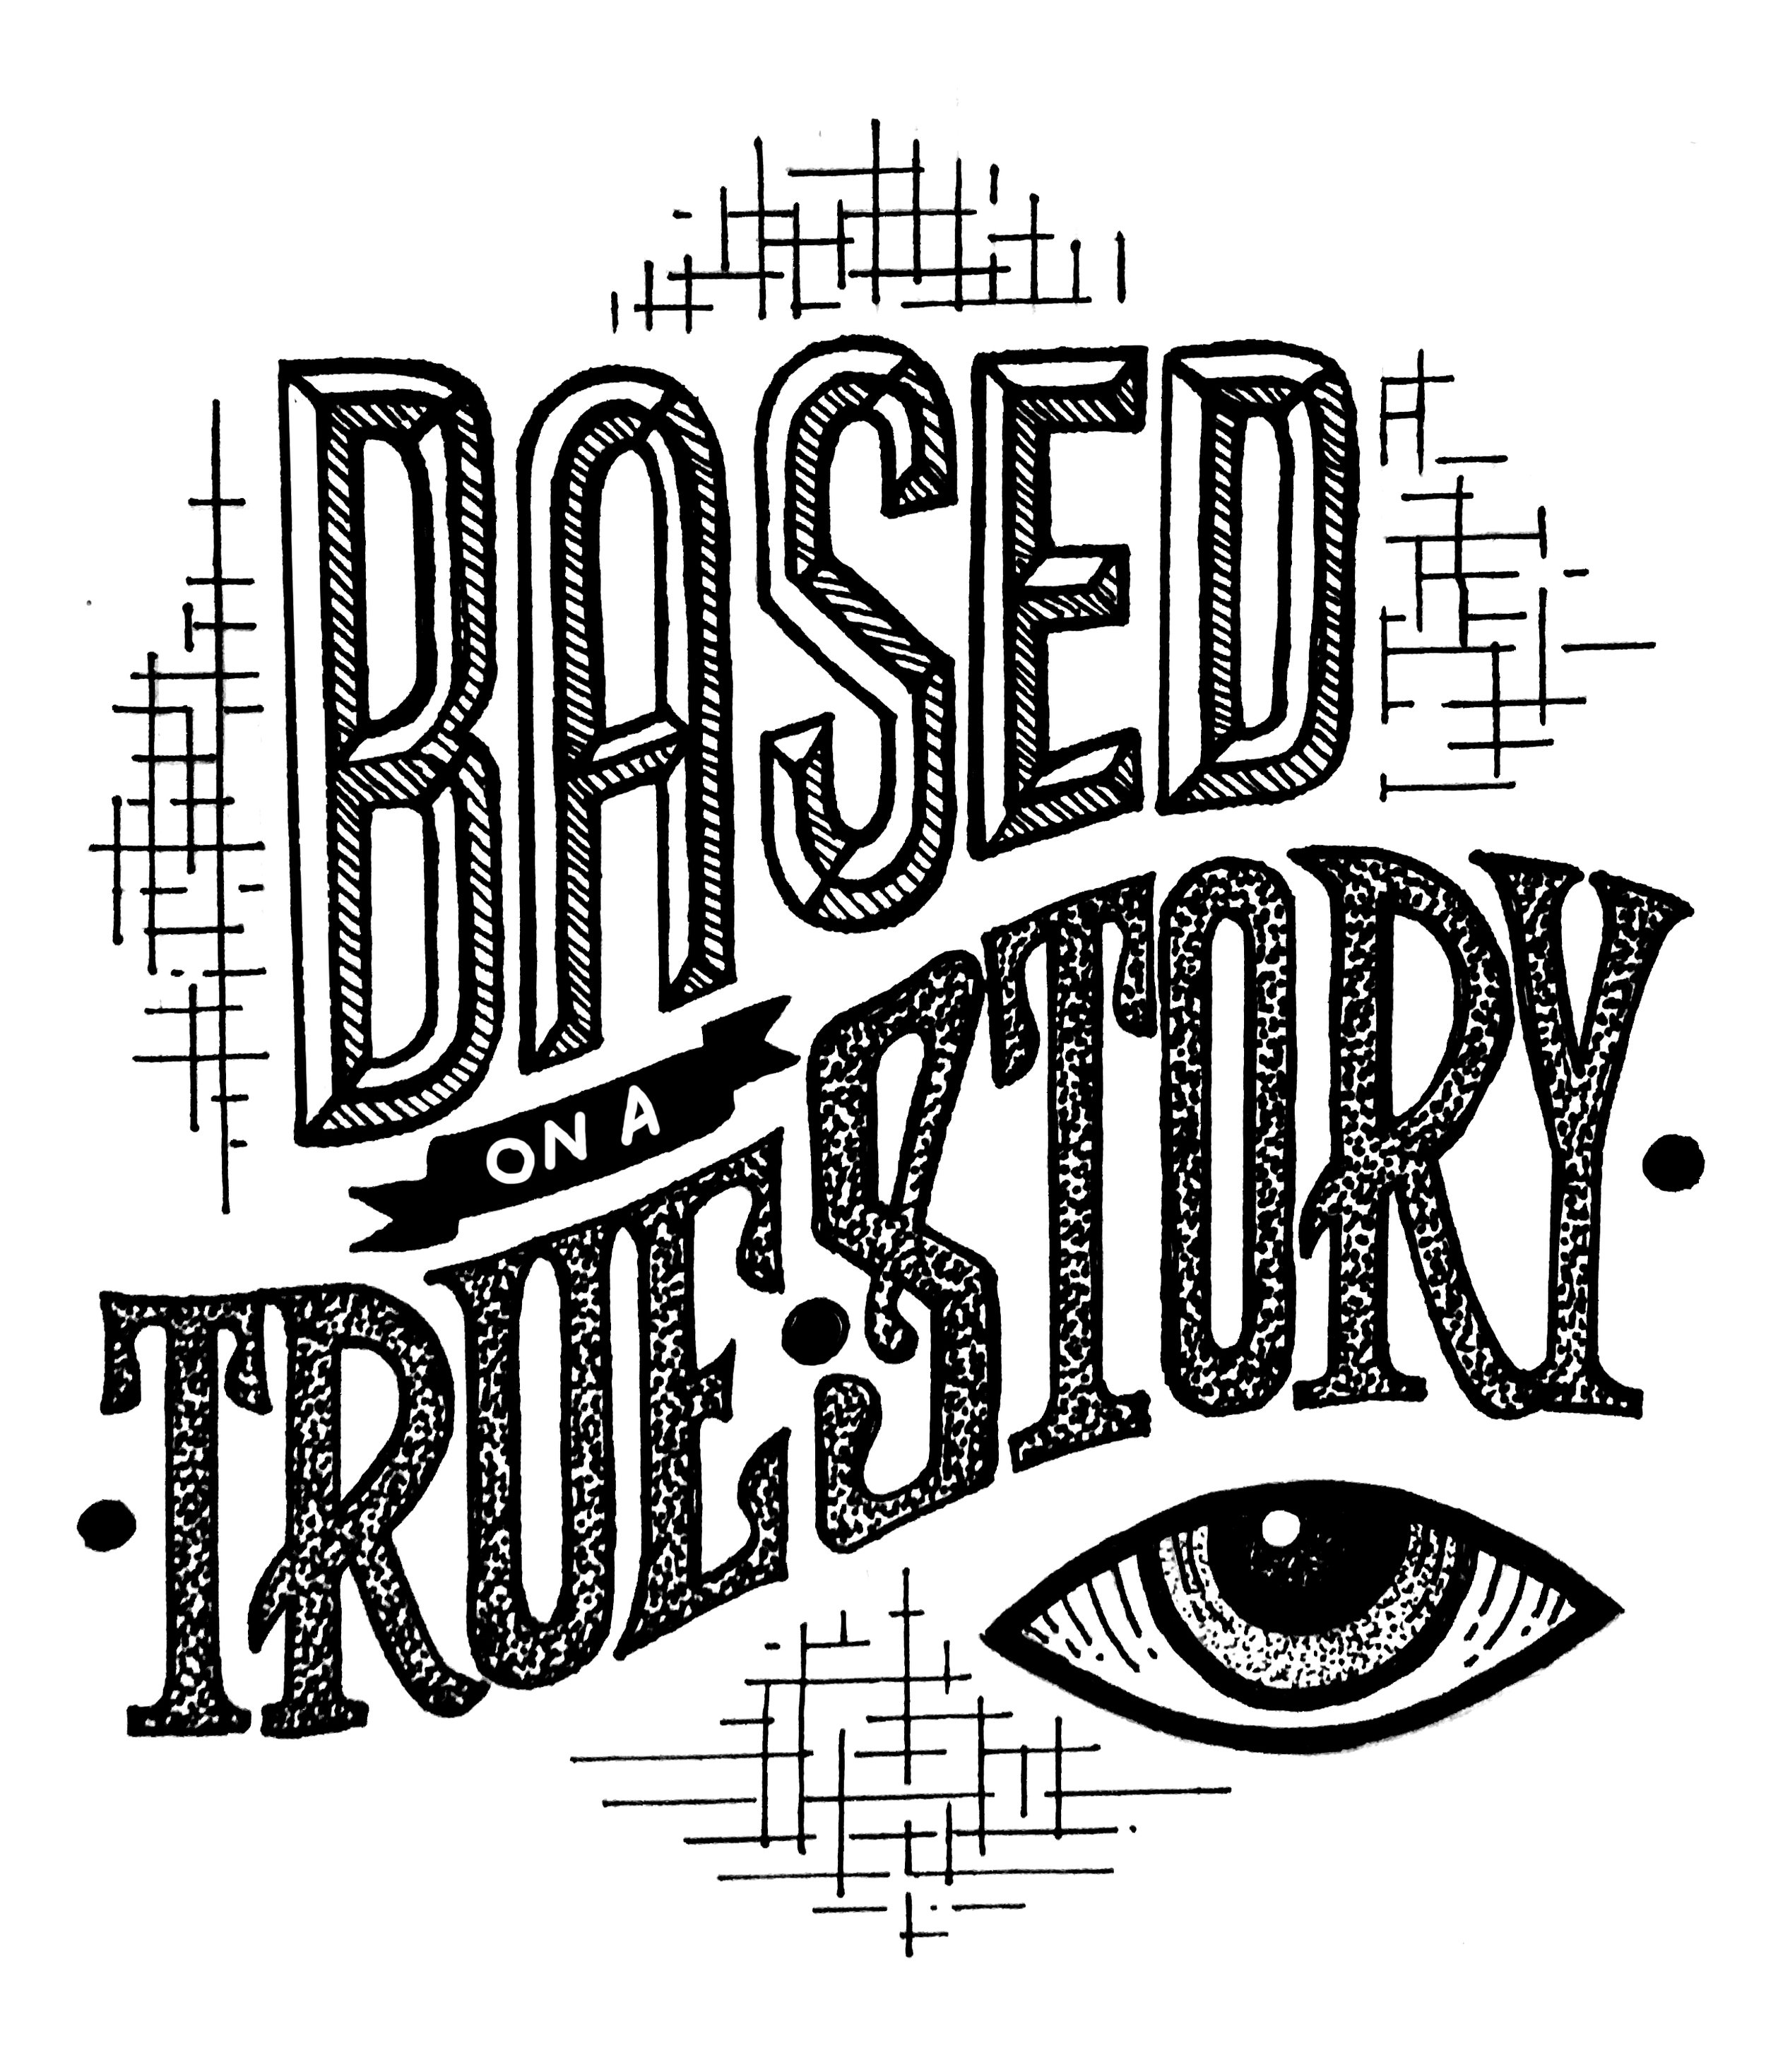 BasedOnATrueStory_OriginalBW.jpg